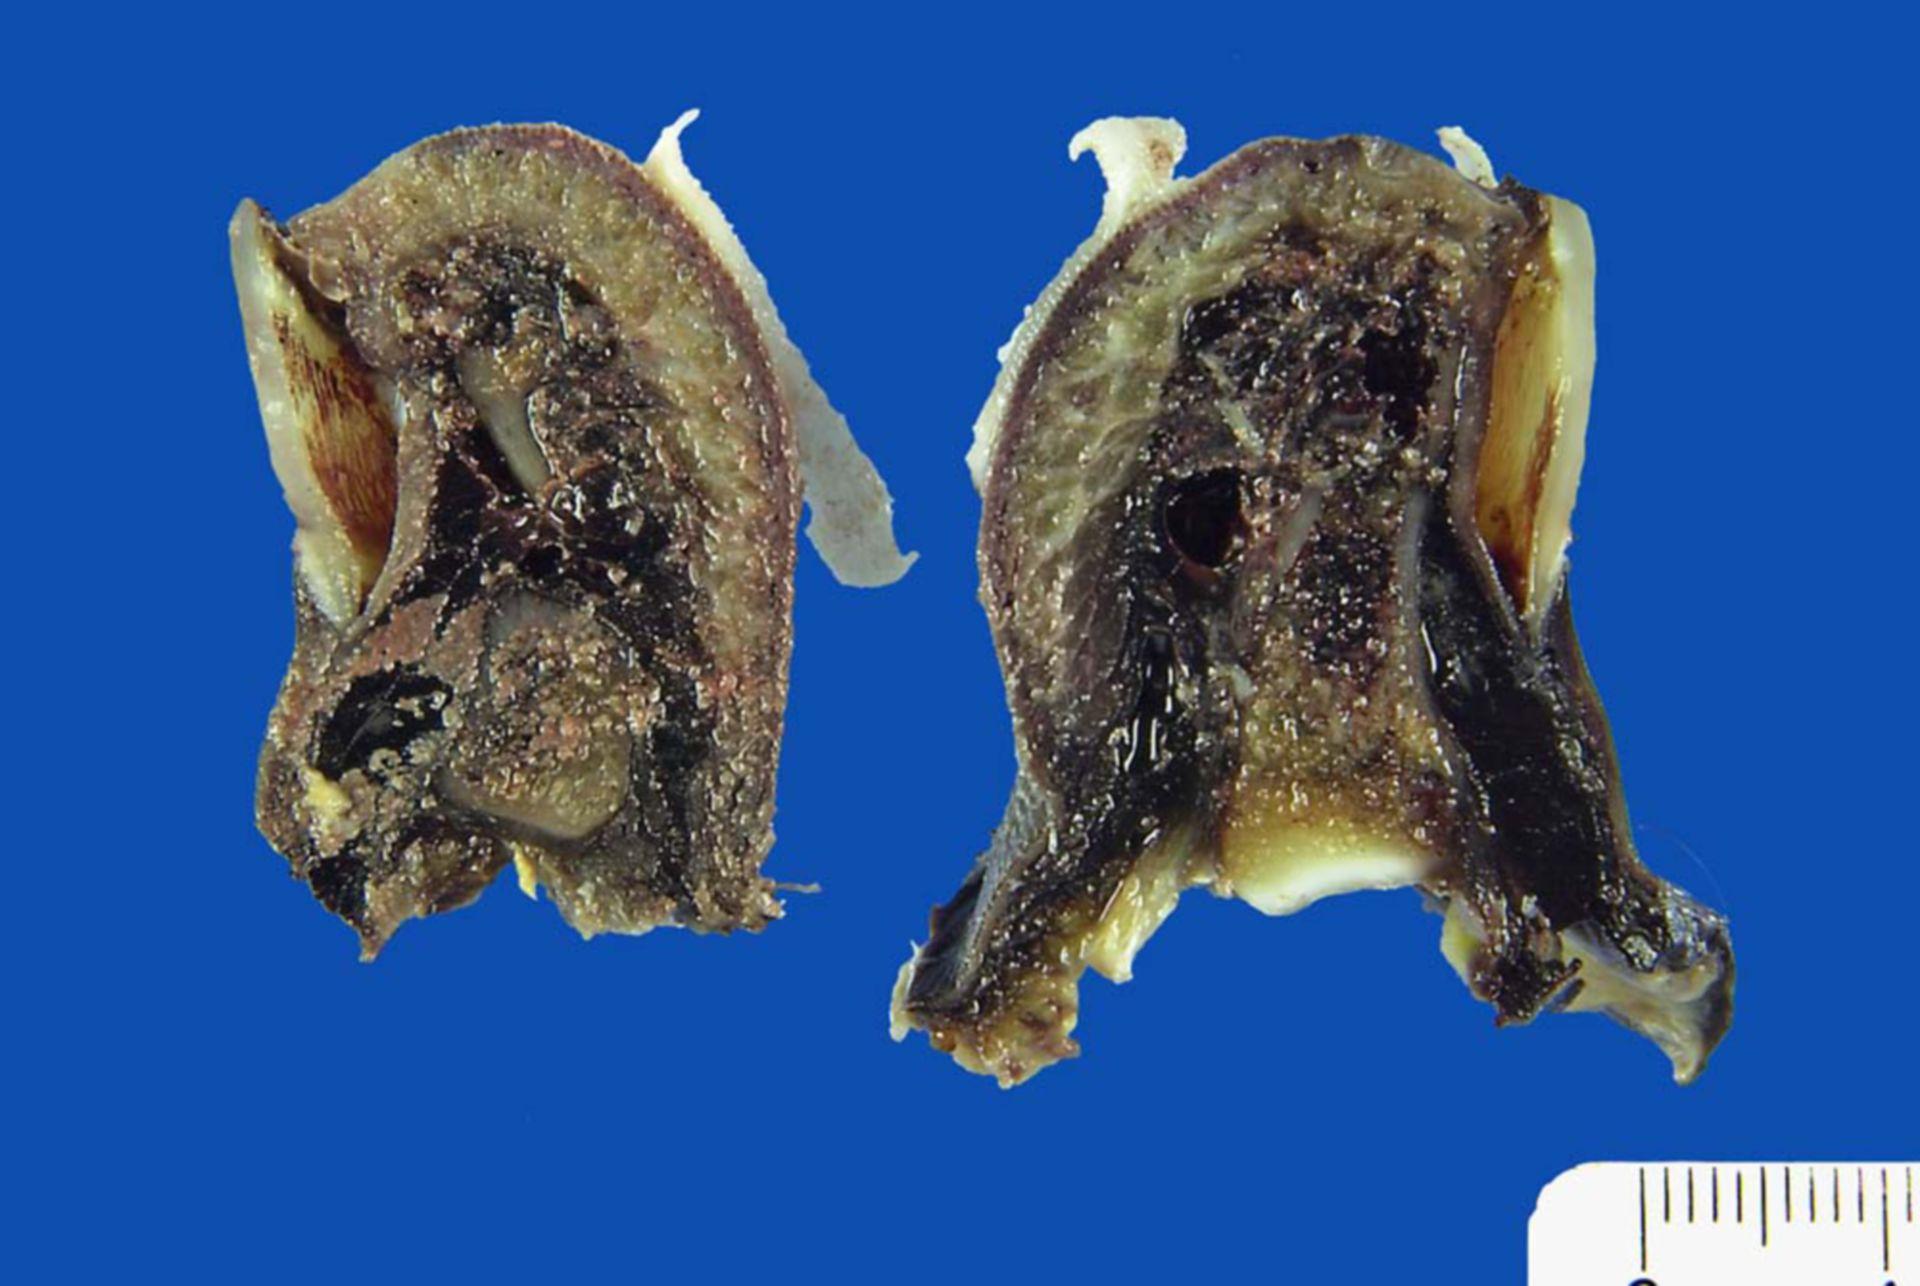 Hemorrhagic necrosis of the big toe after contusion